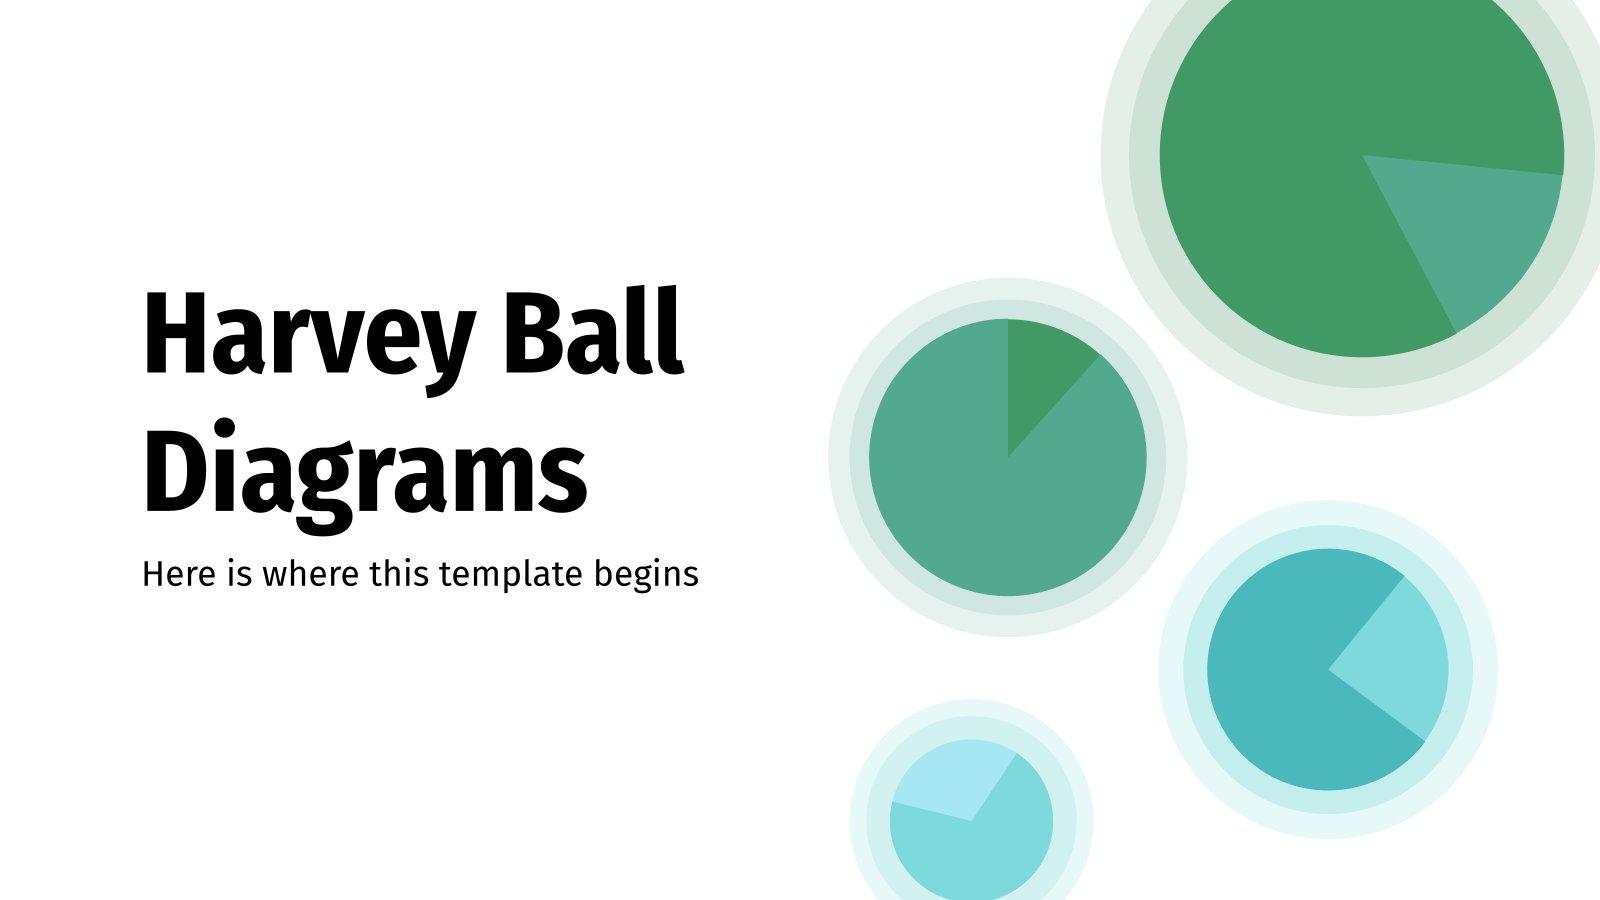 Harvey Ball Diagrams presentation template